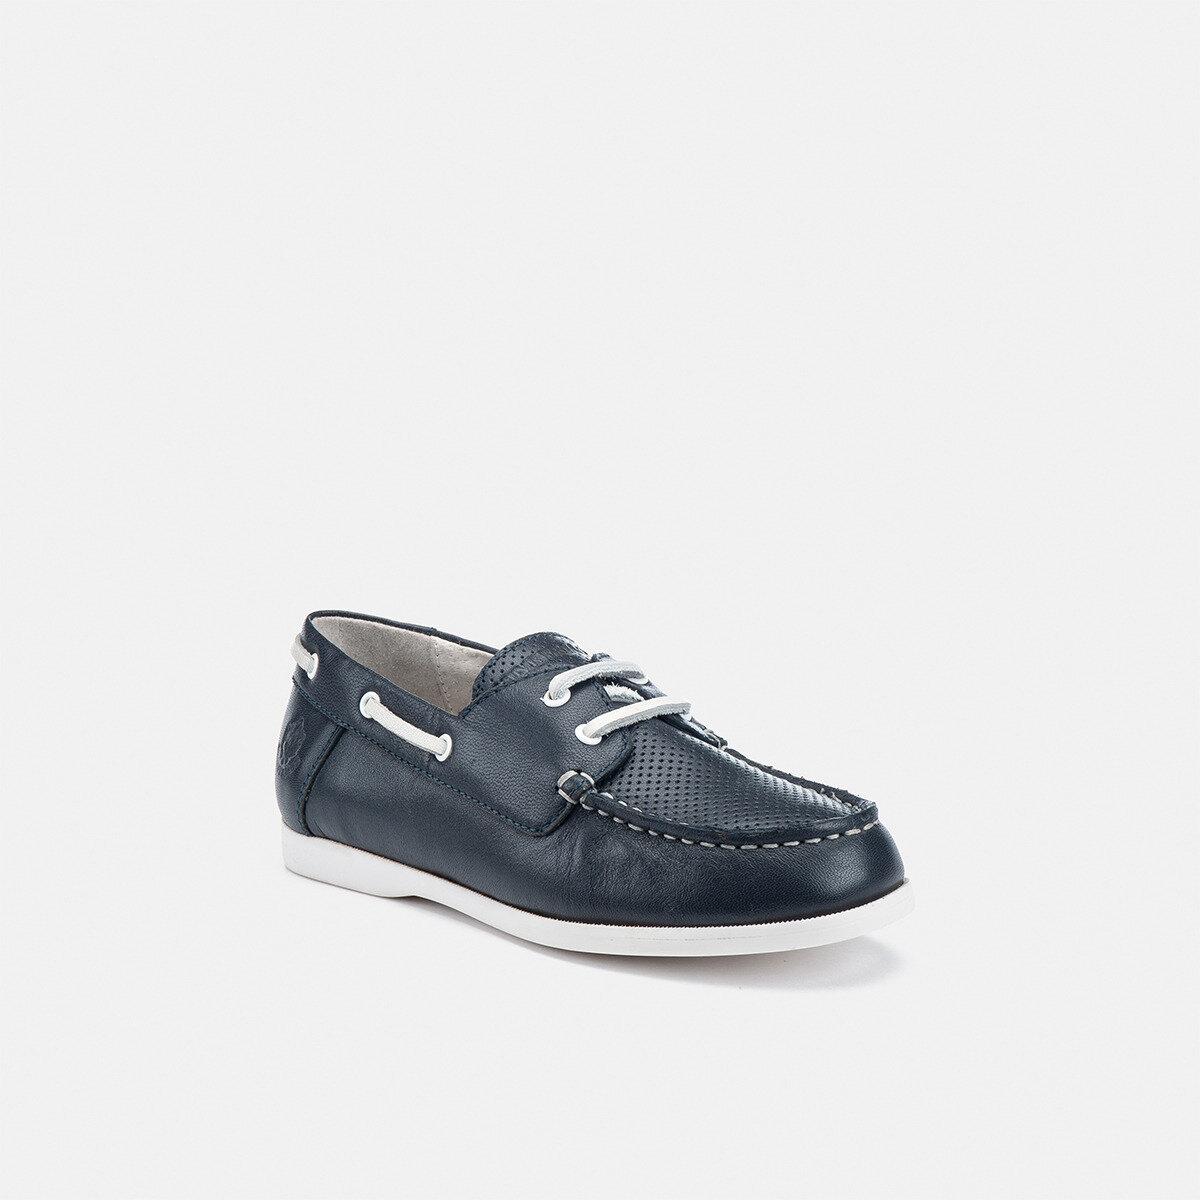 SAILOR NAVY BLUE Boy Boat shoes